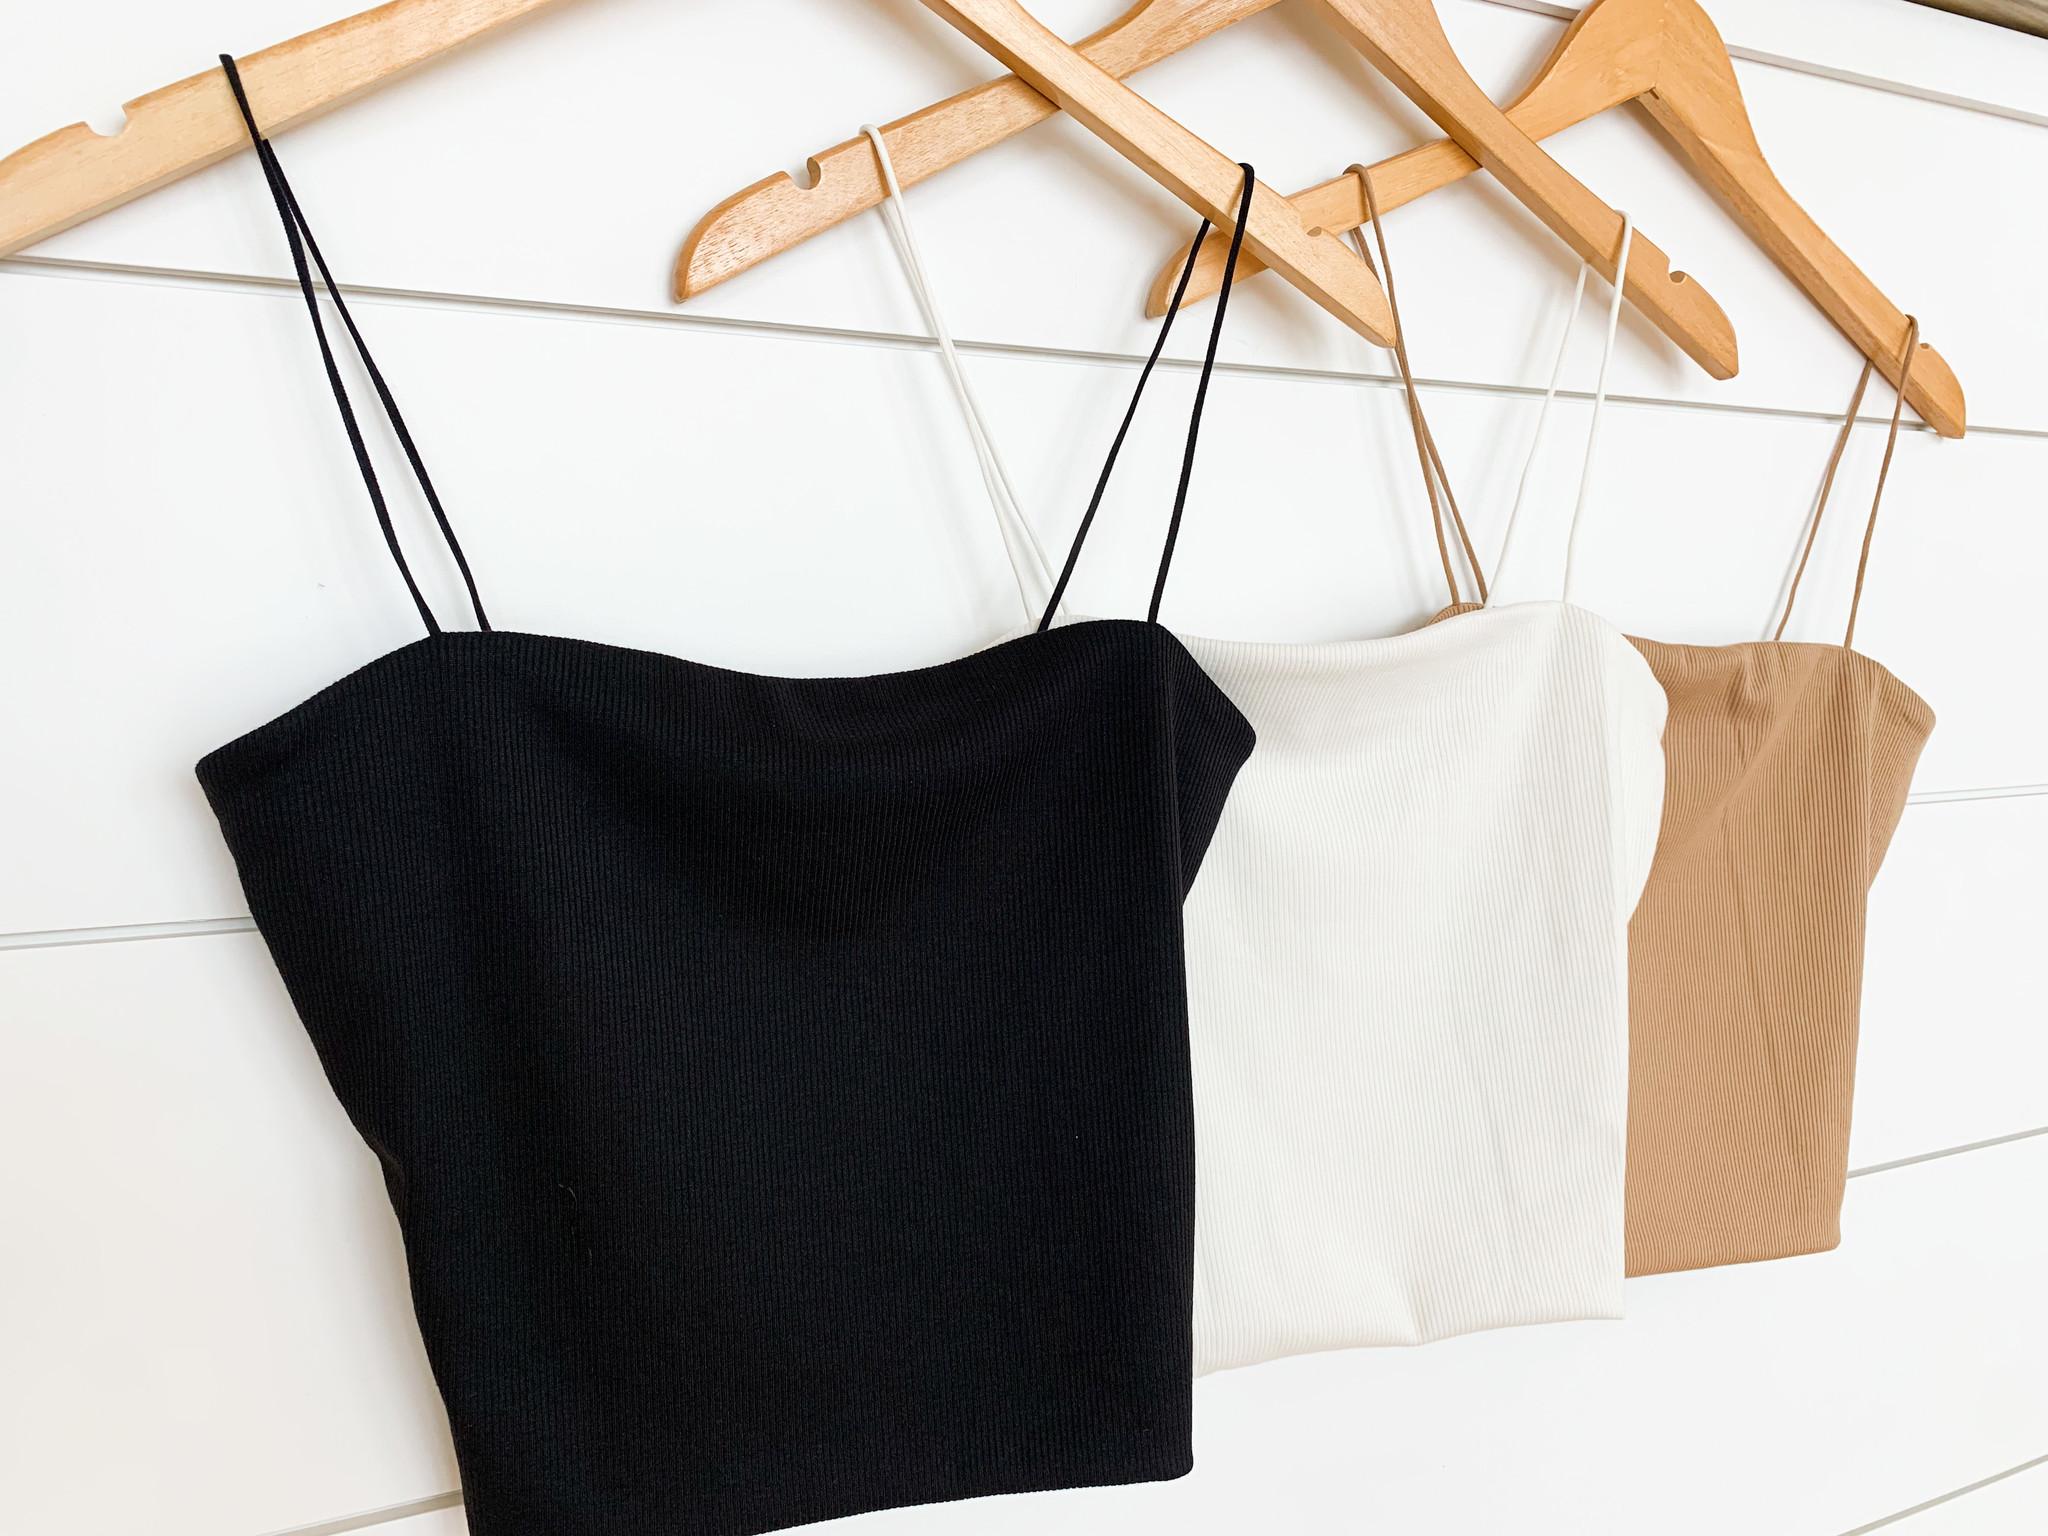 Basic Rib Knit Cami Top